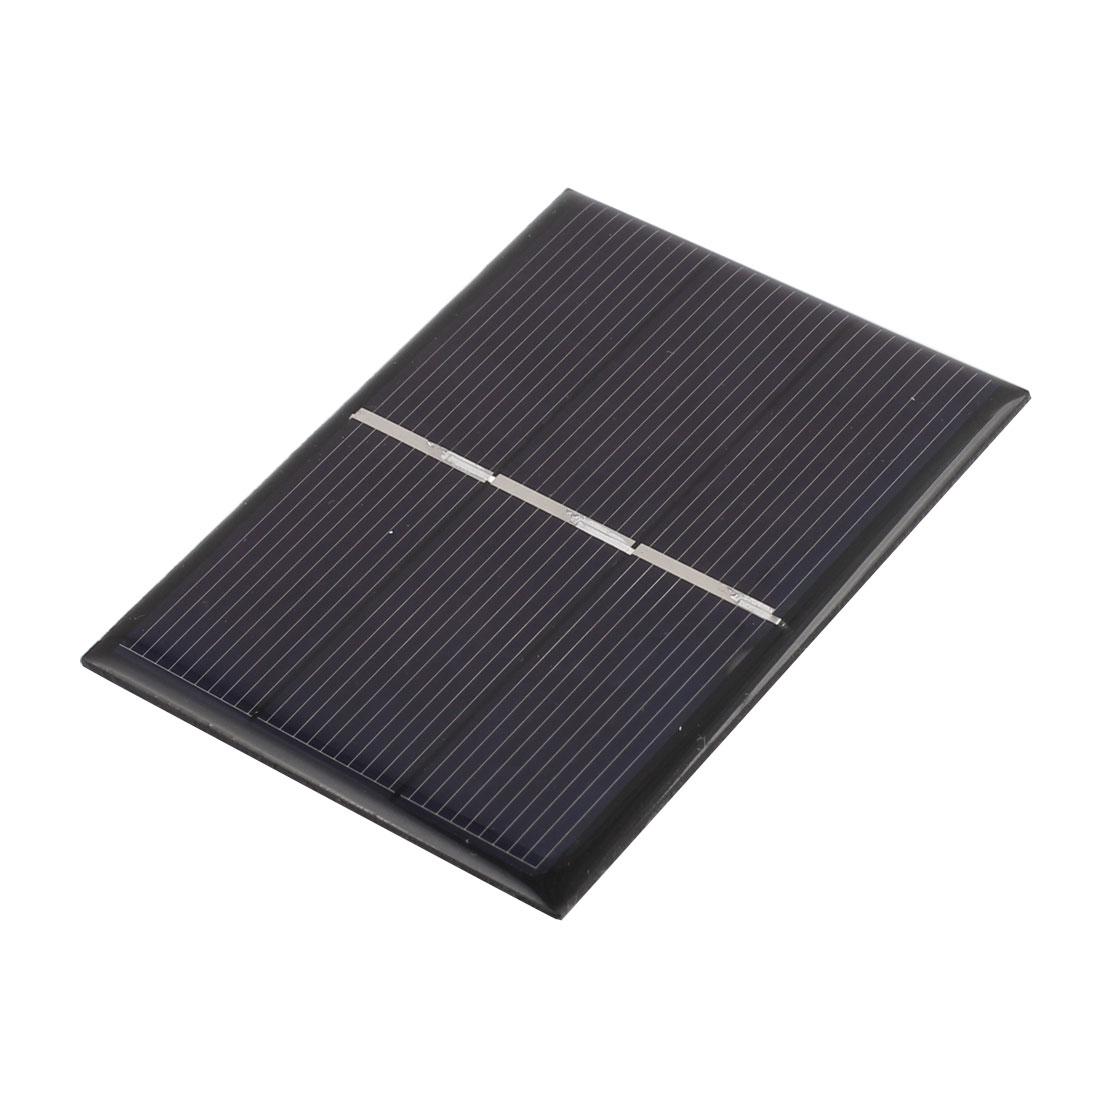 80mm x 60mm 0.65 Watts 1.5 Volts Polycrystalline Solar Cell Panel Module